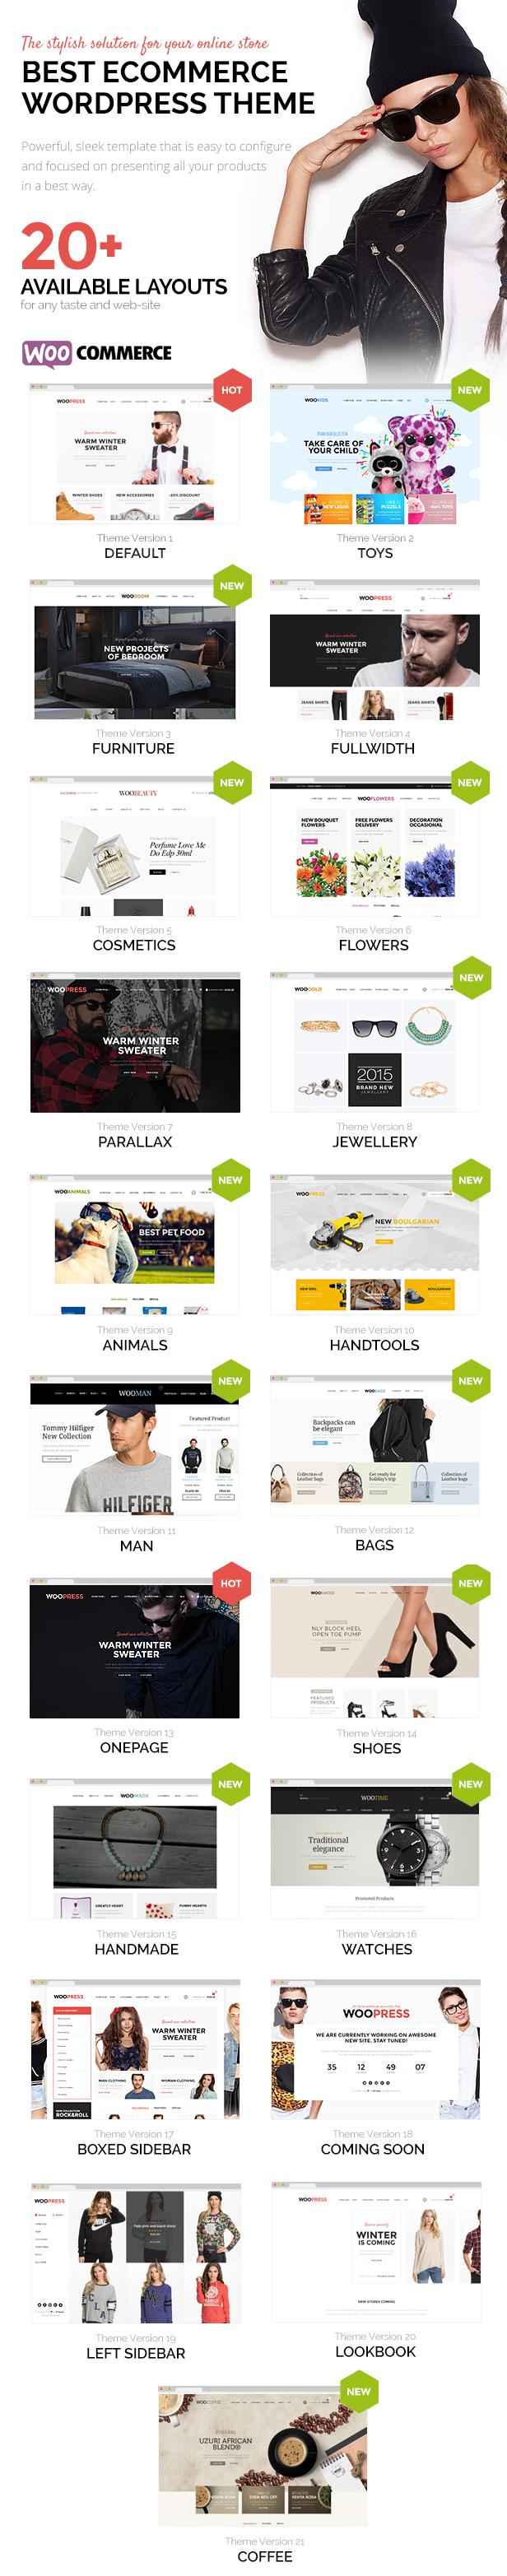 01 - WooPress - Responsive Ecommerce WordPress Theme